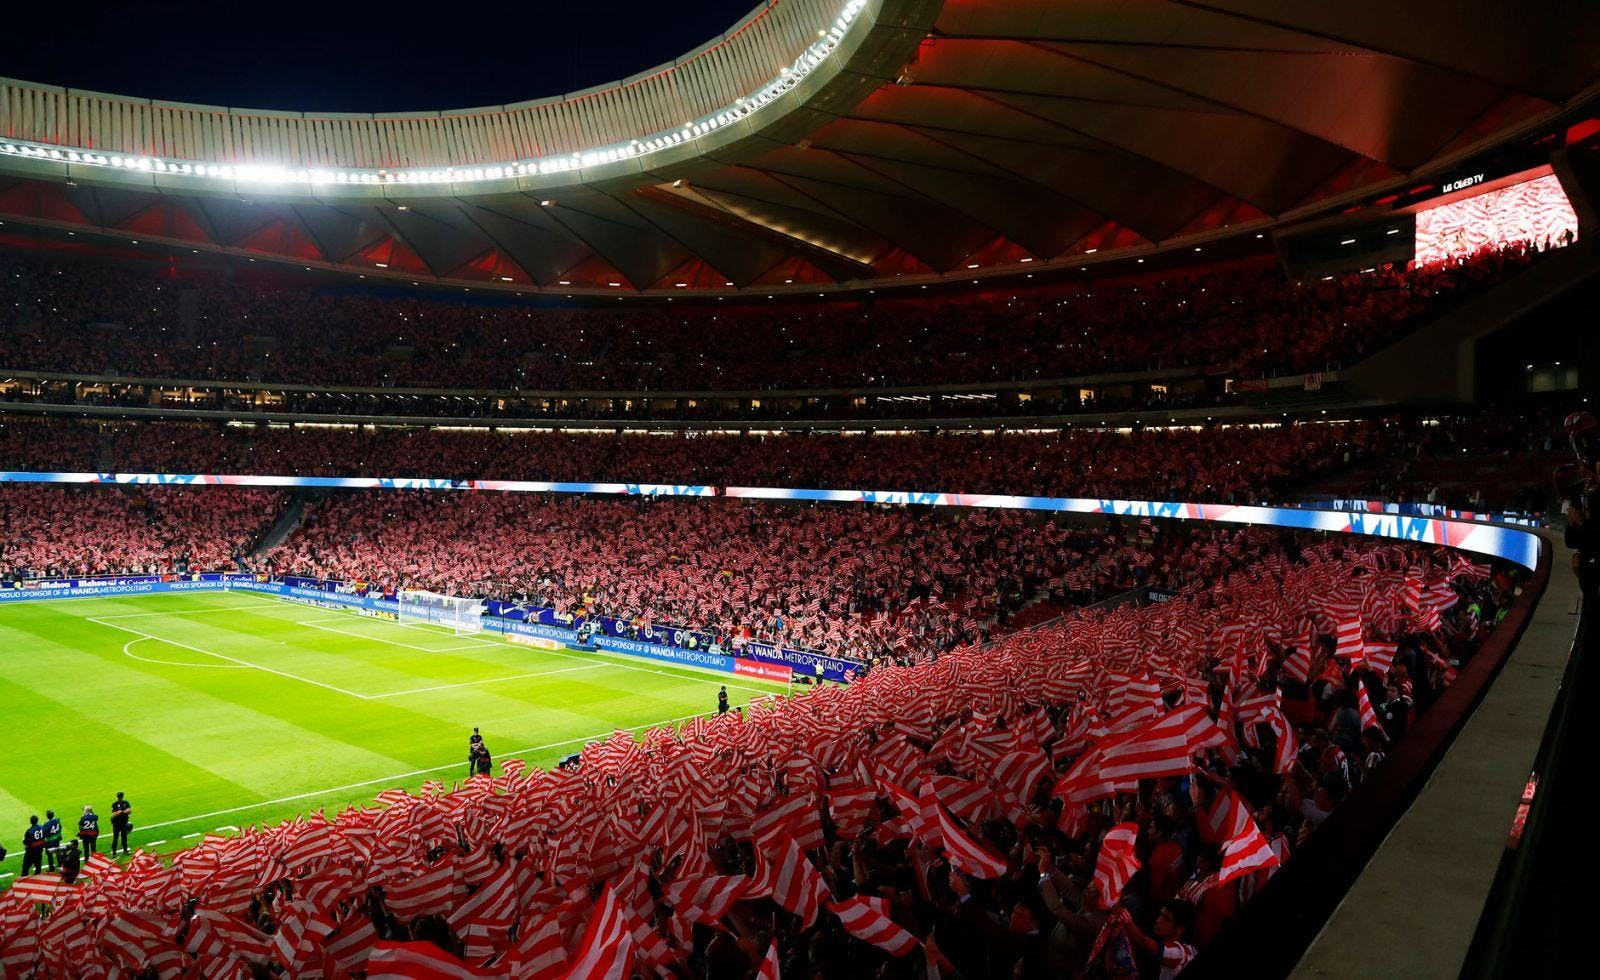 Club Atltico de Madrid v Real Valladolid CF - VIP Hospitality Tickets